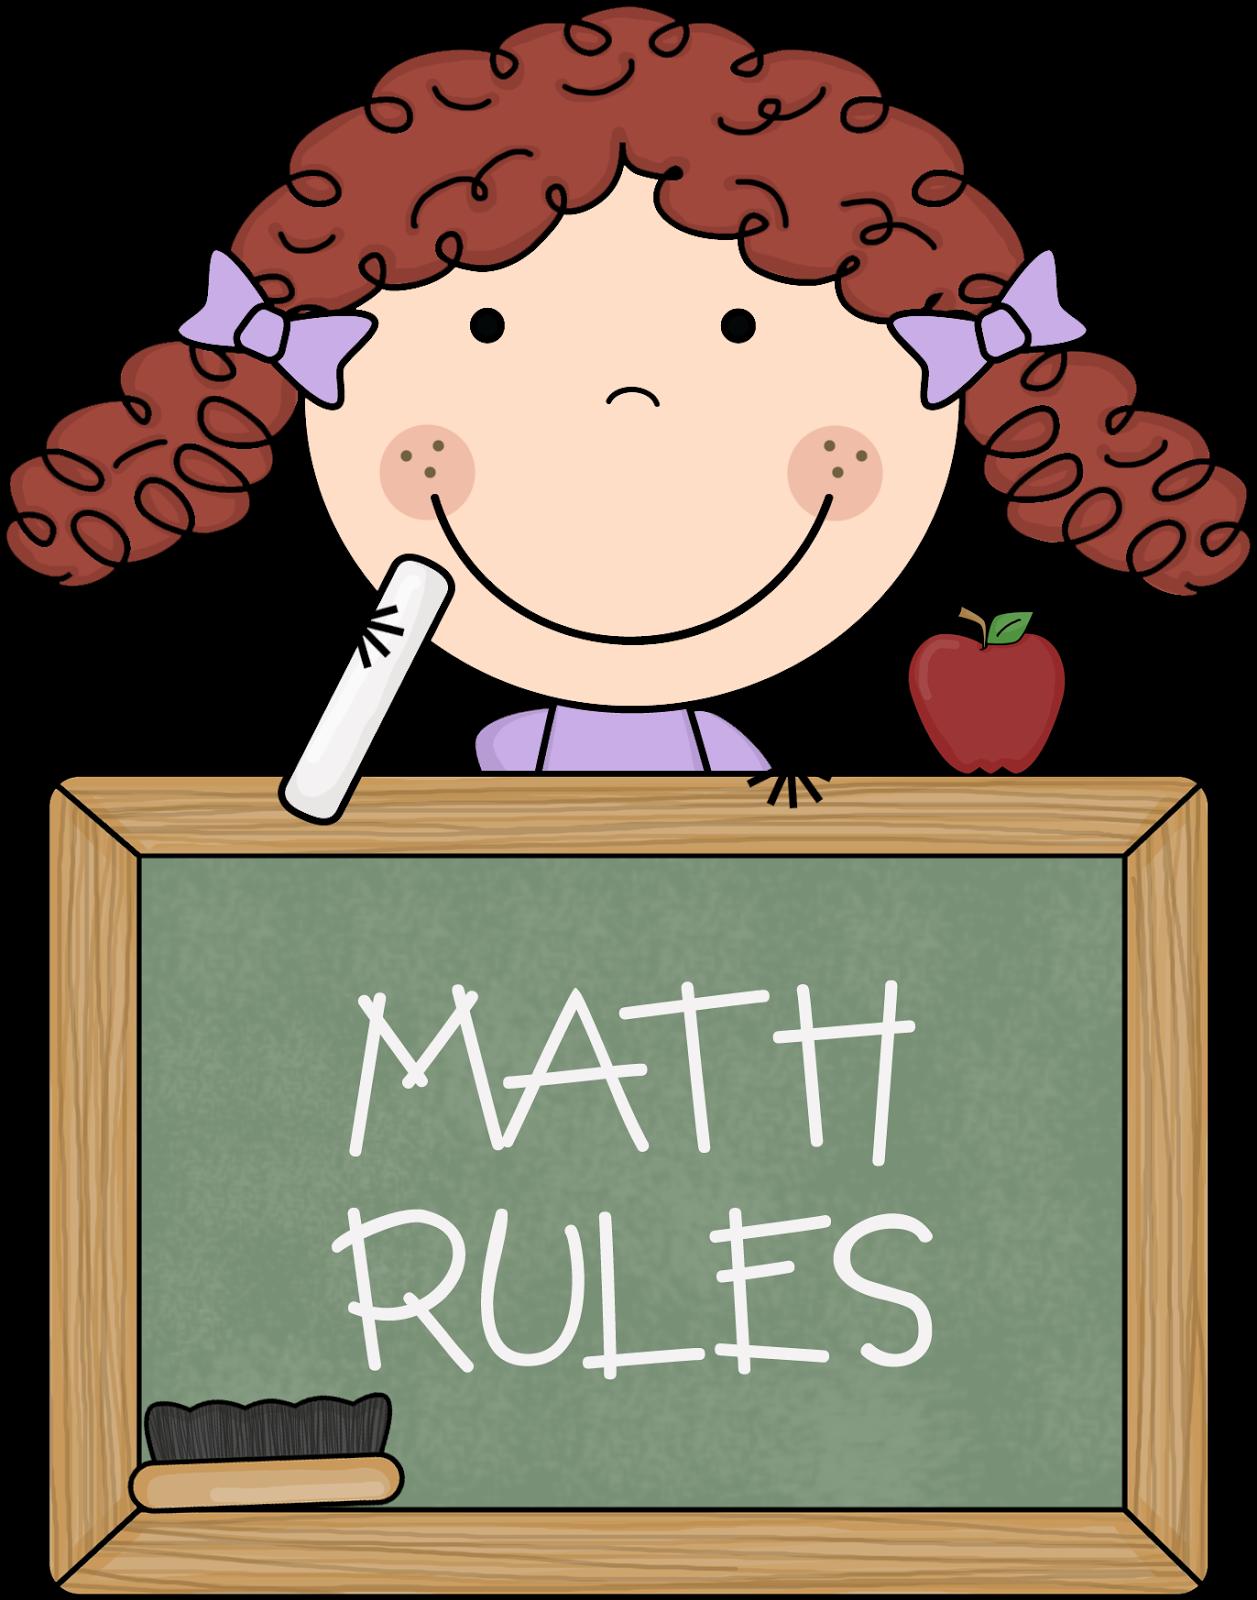 Frees student. Math teacher that